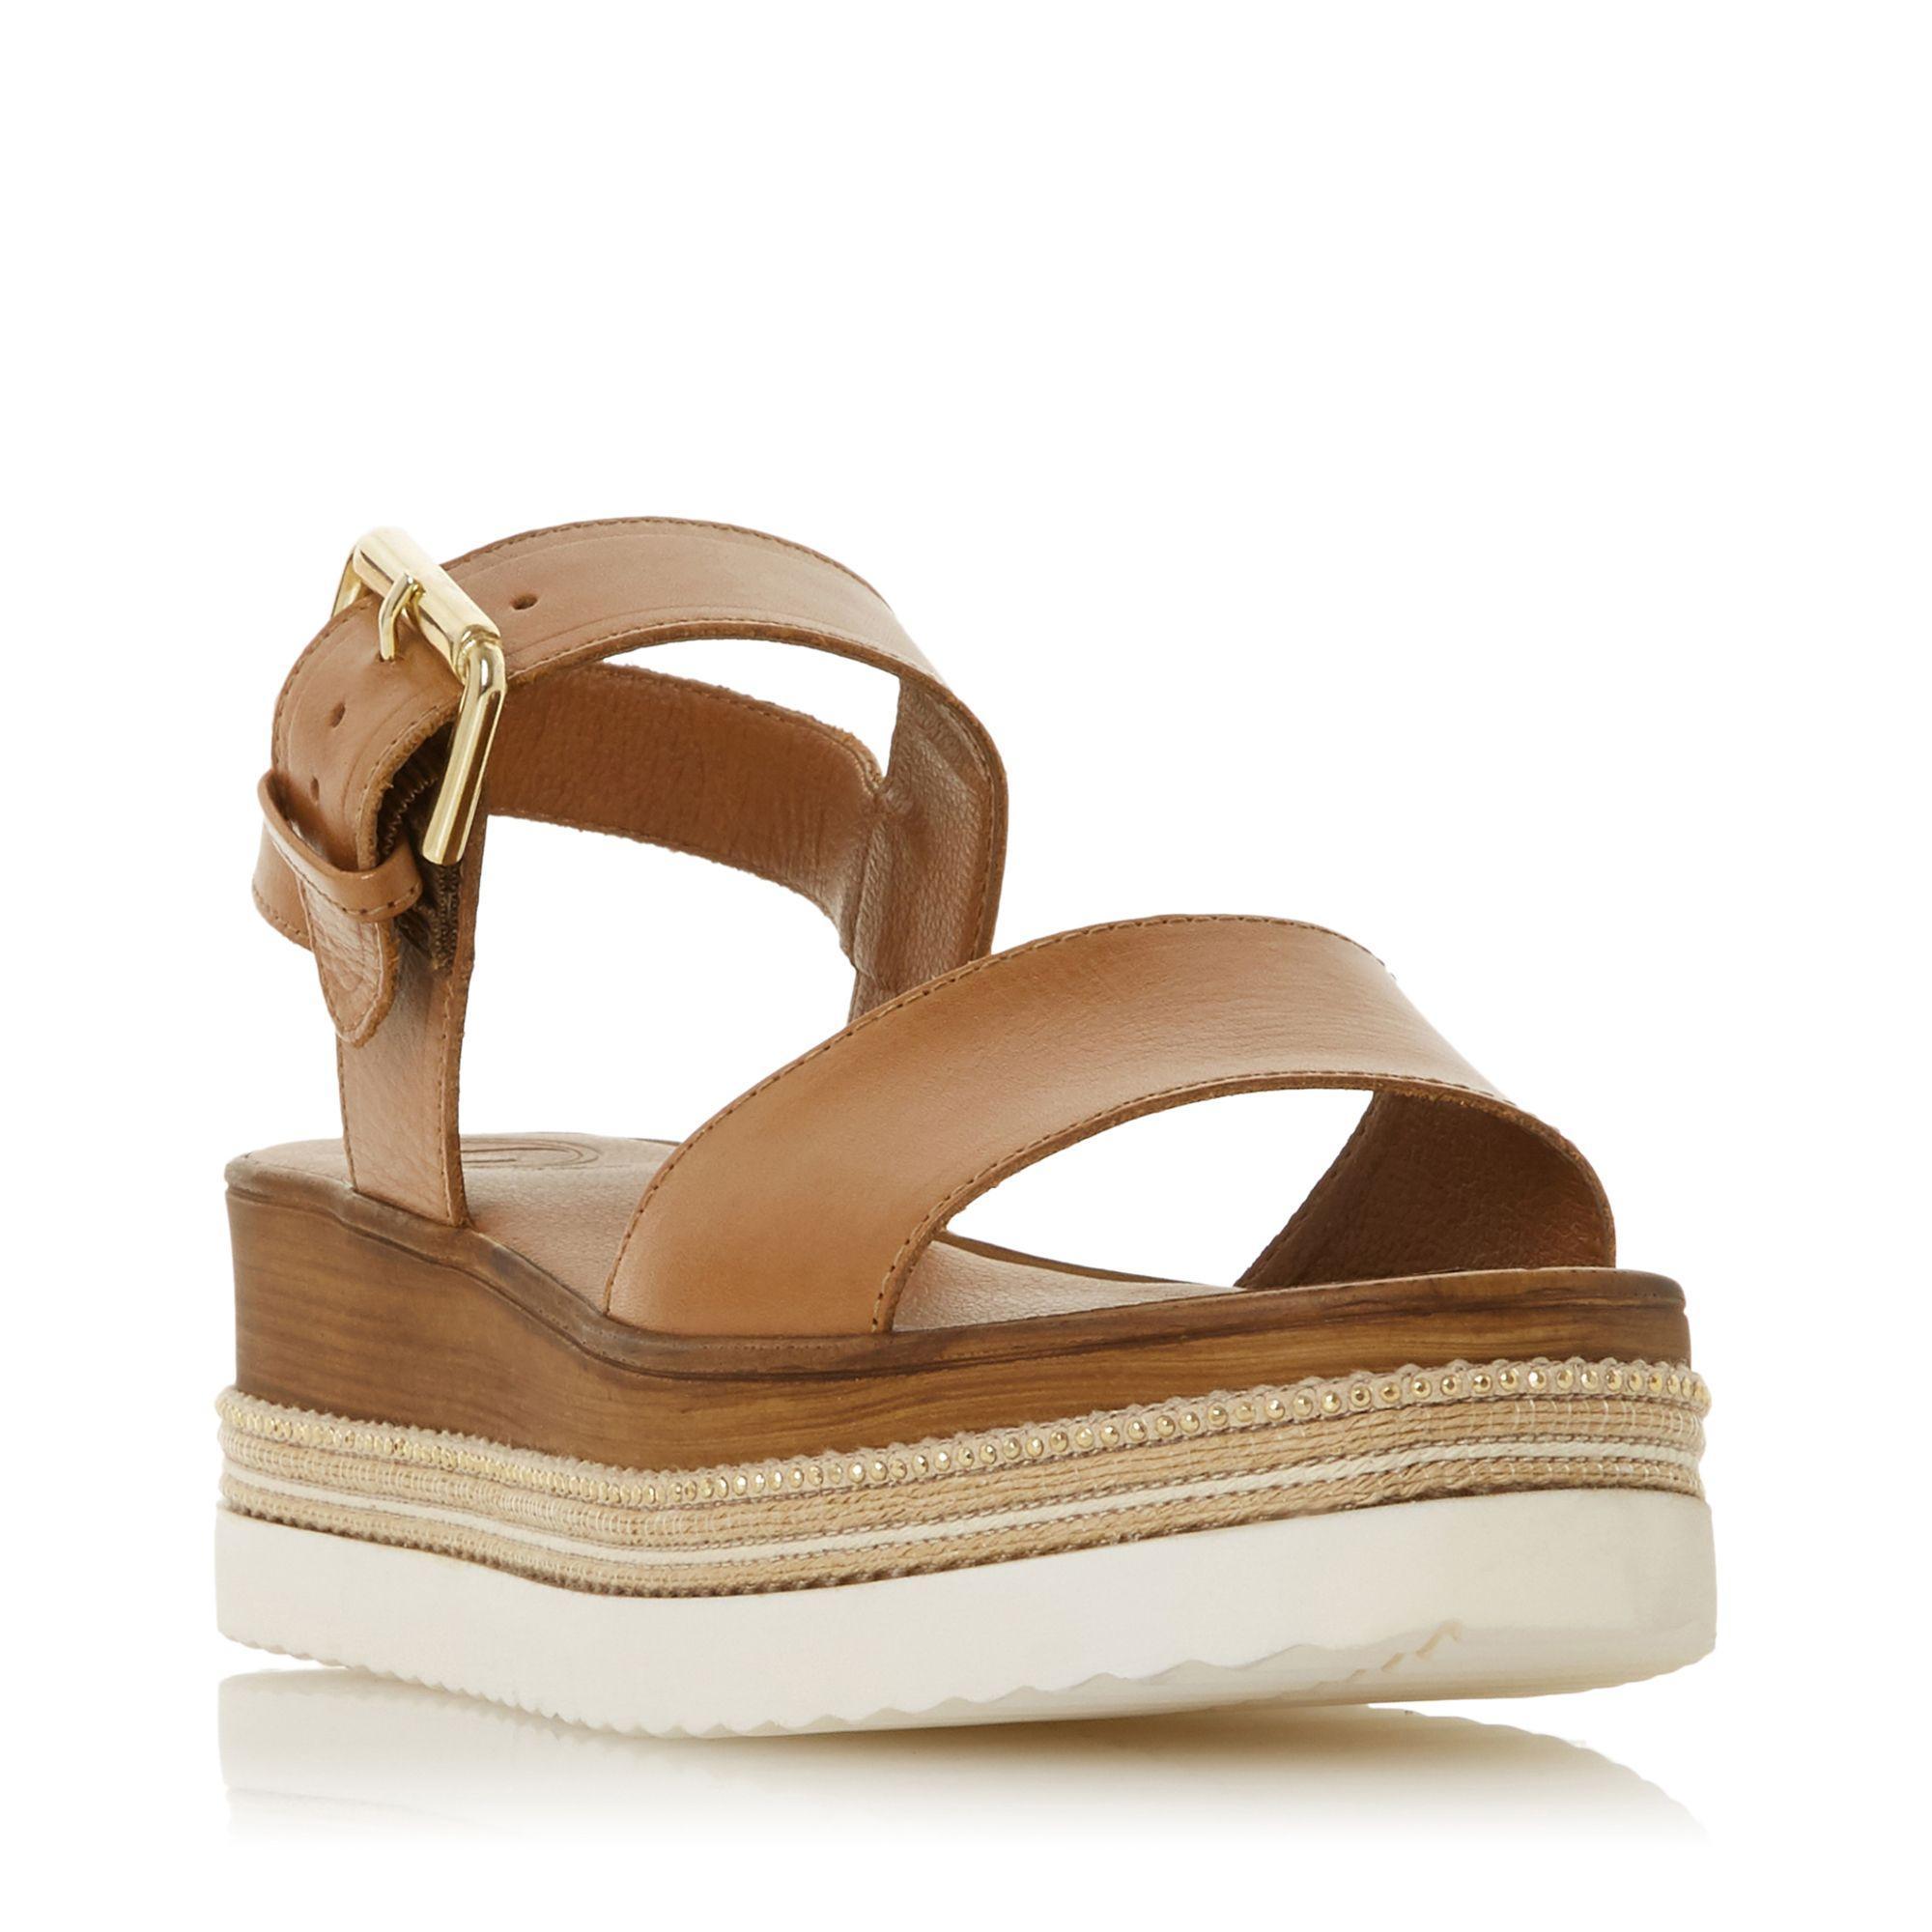 8fb420b59c0 Dune. Women s Brown Tan Leather  kaze  Mid Wedge Heel Ankle Strap Sandals